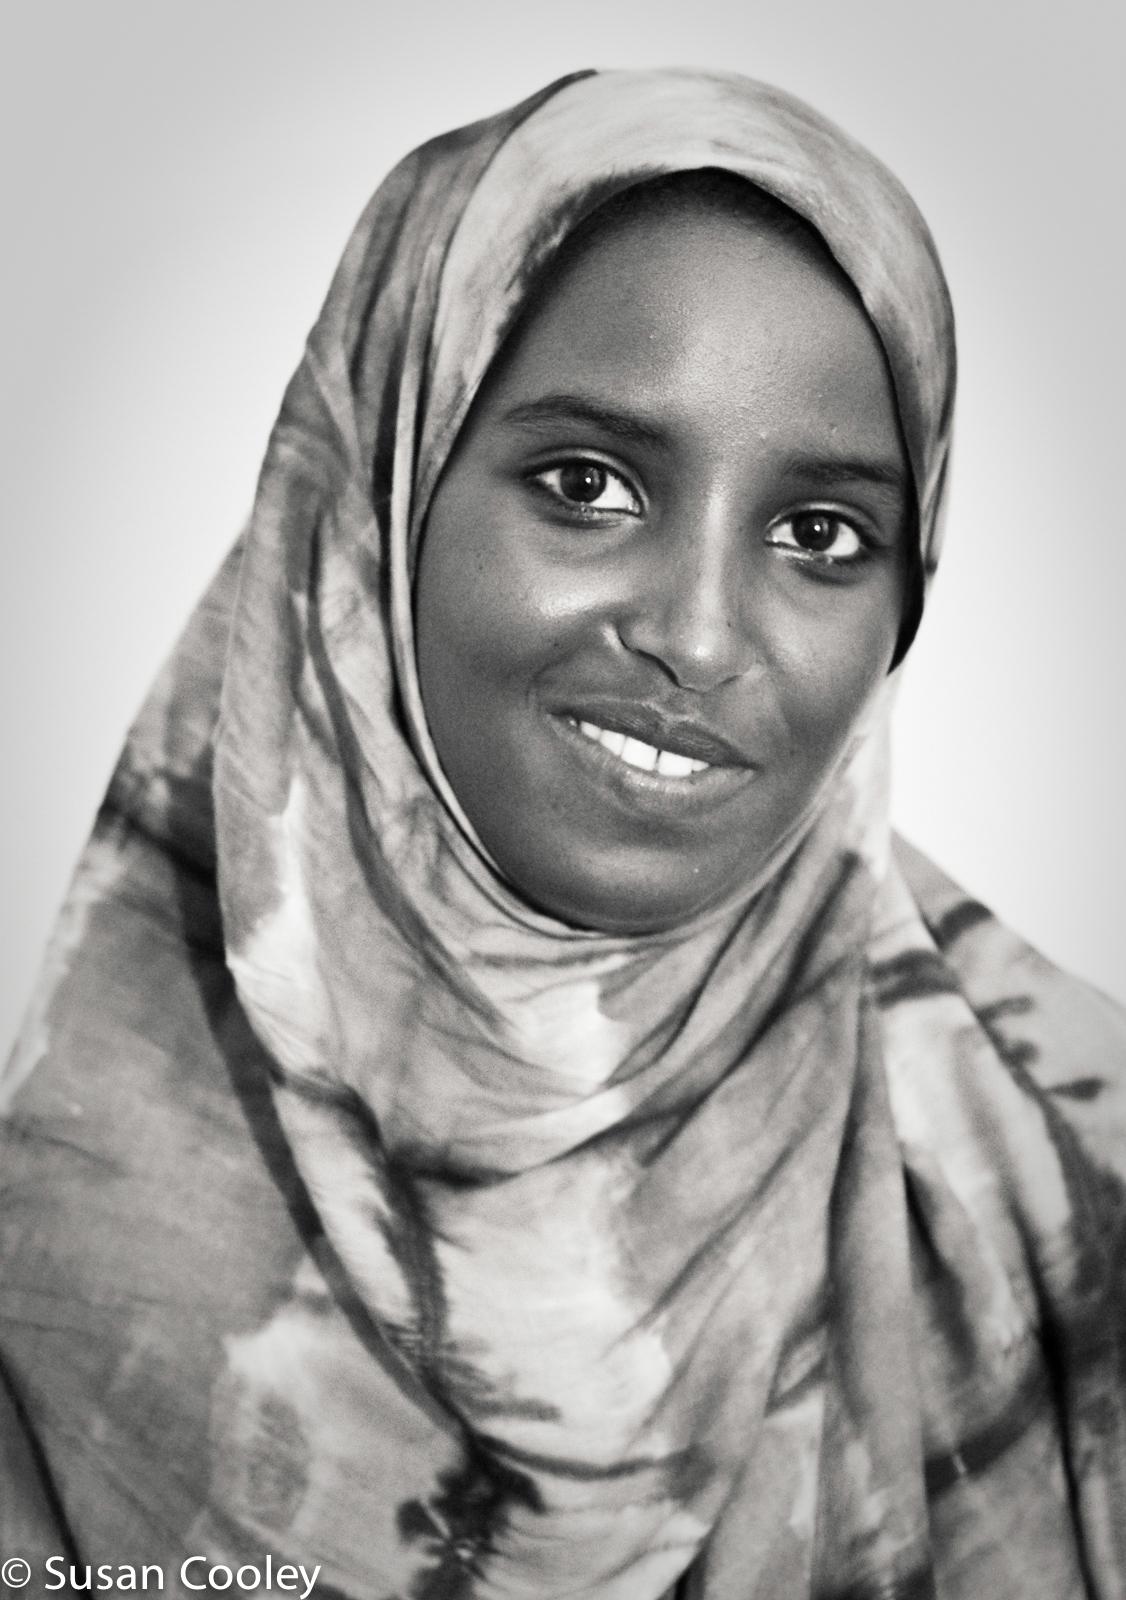 Somali refugee.